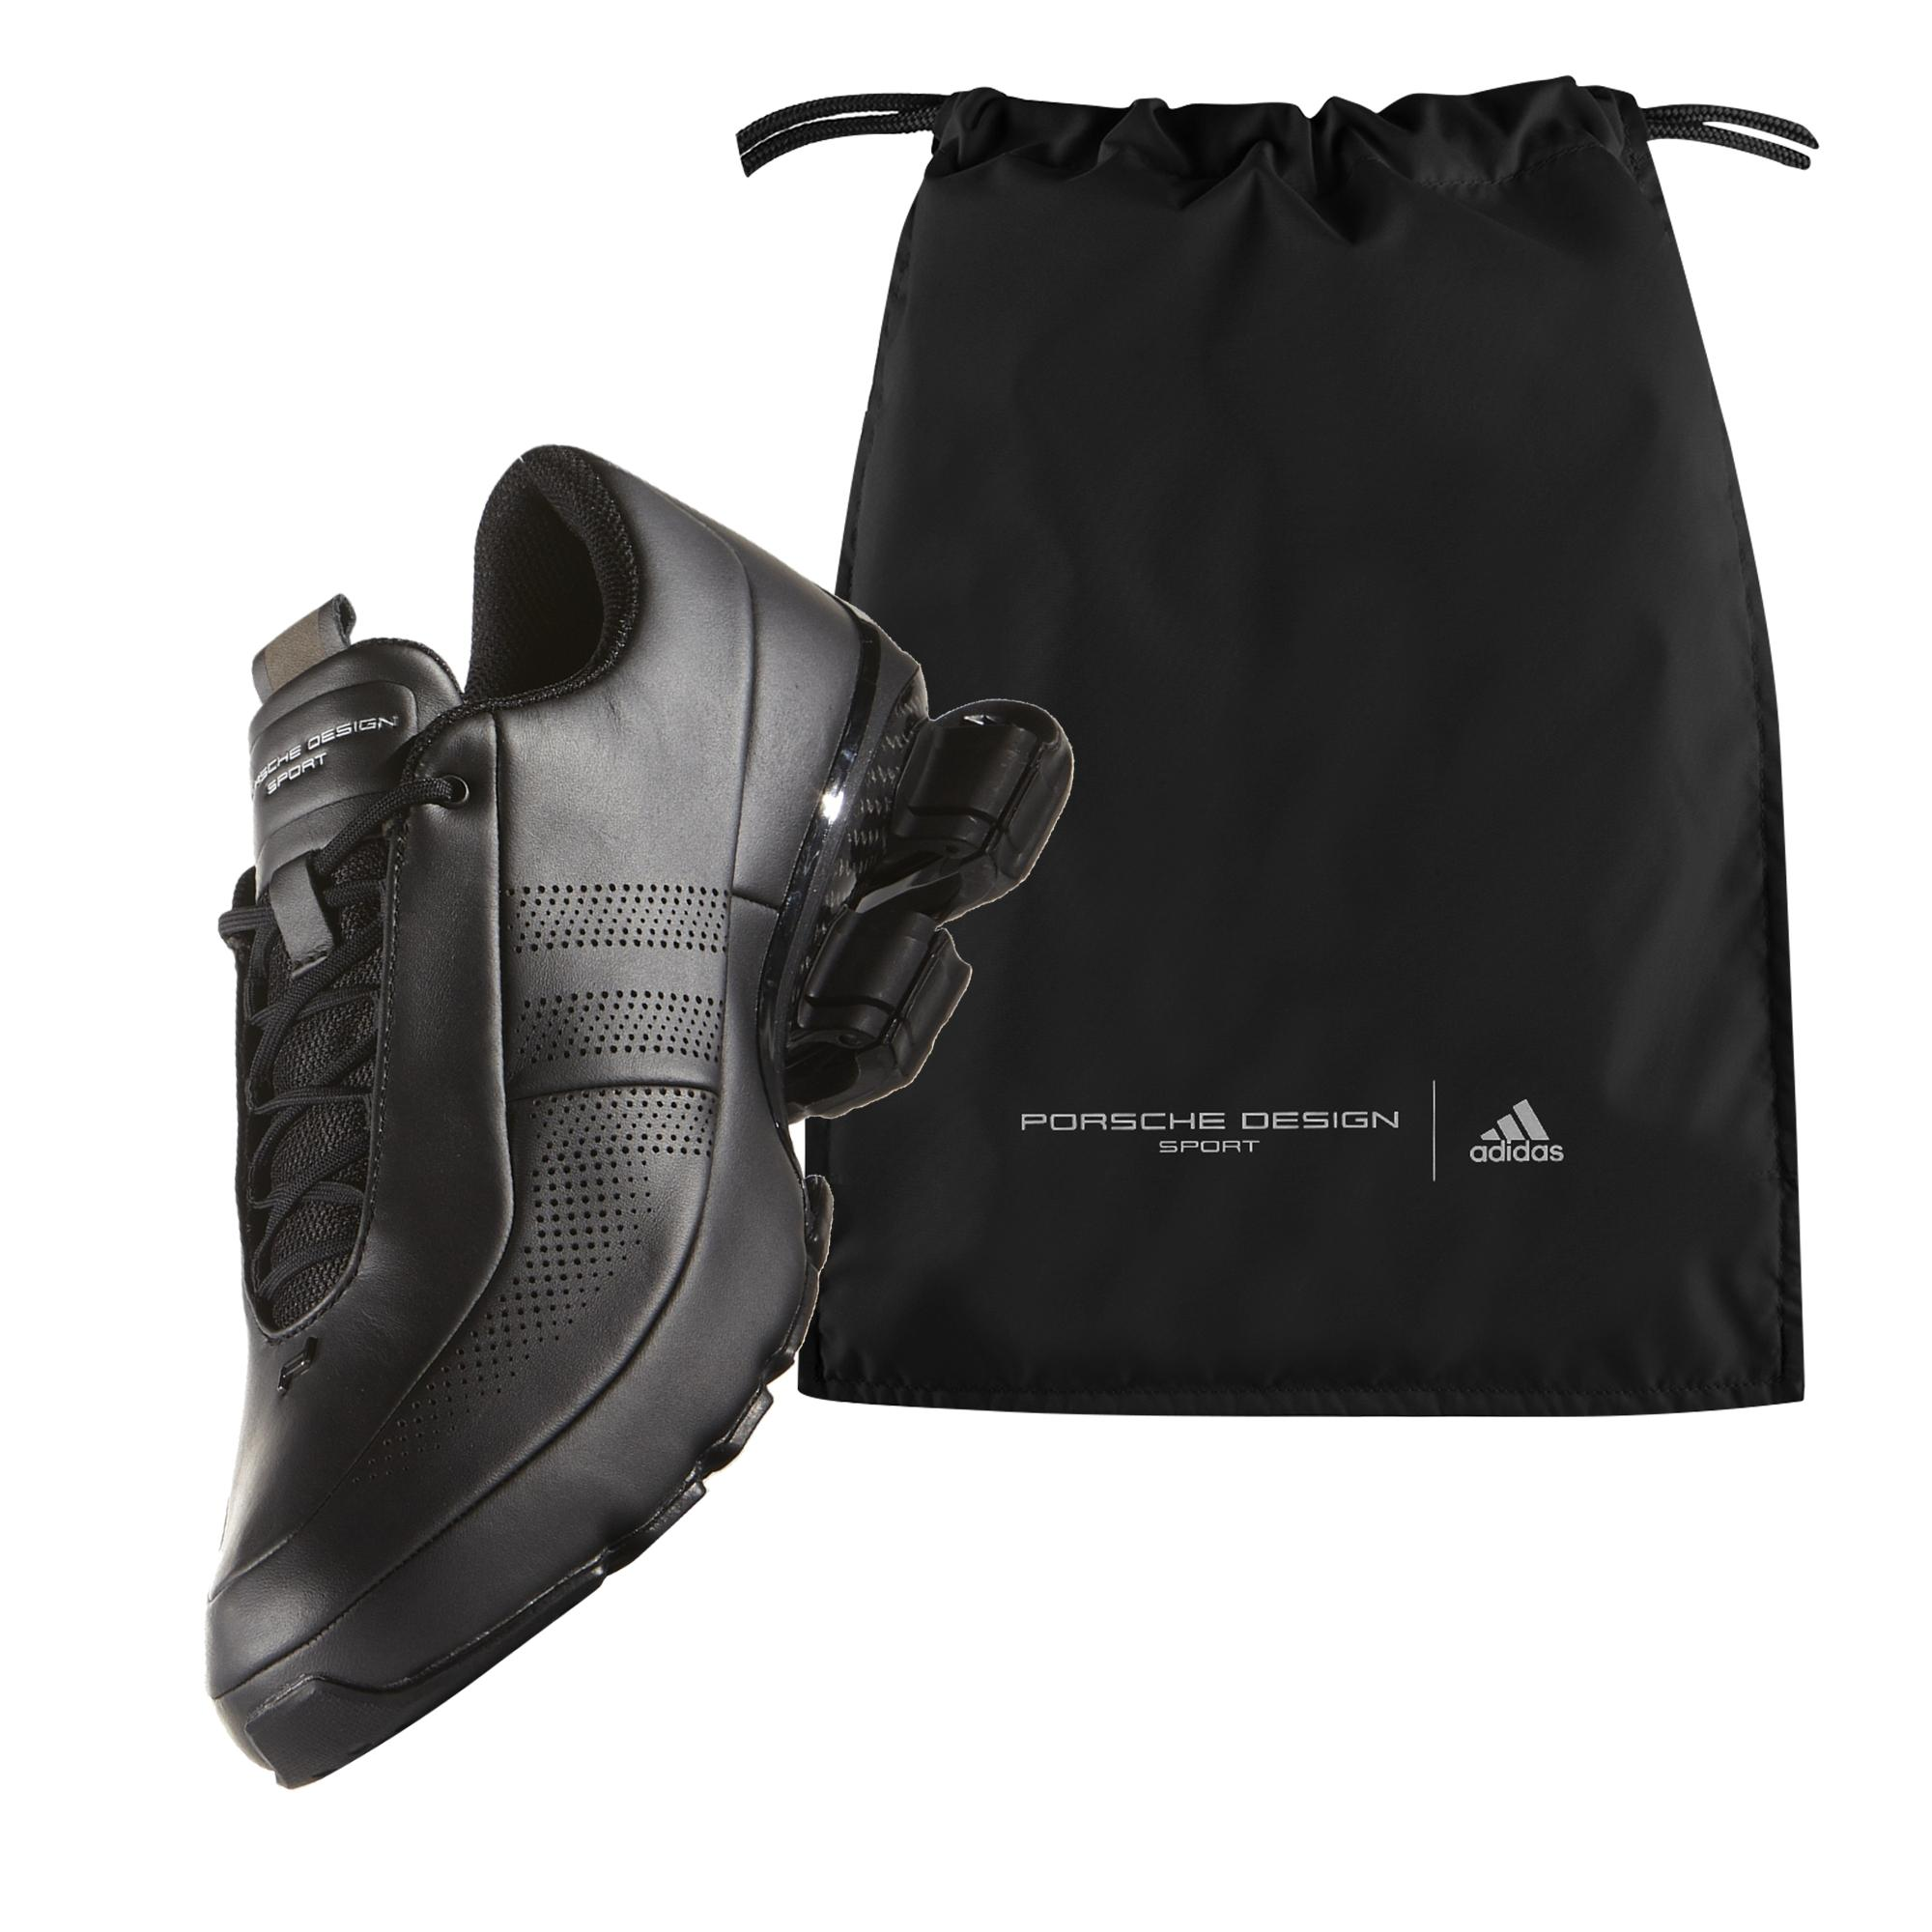 timeless design d04ac 1c0ce promo code for adidas porsche design bounce s 4 fiyat 79205 ...